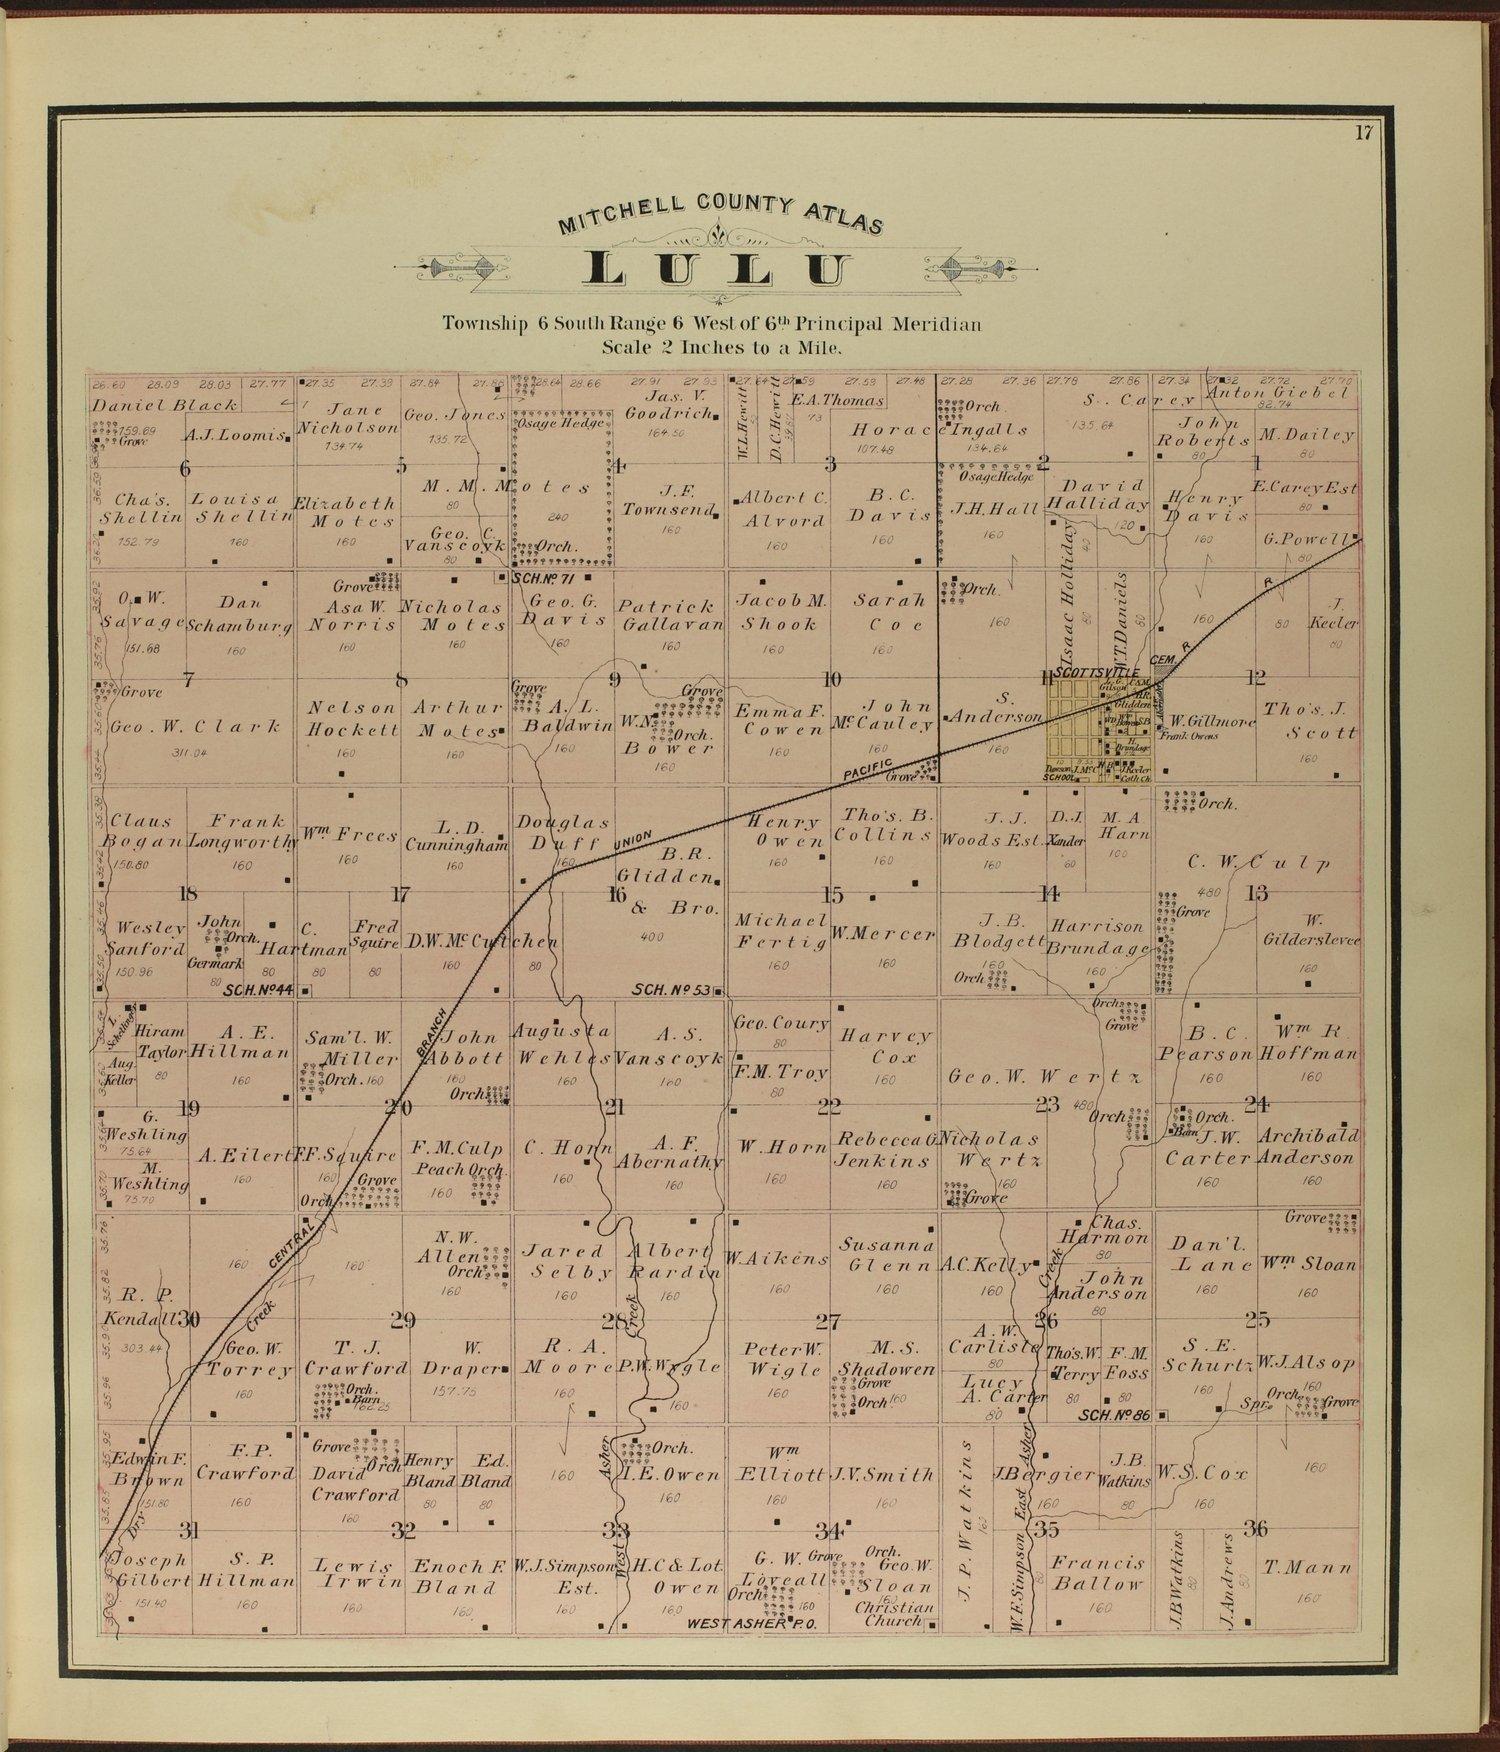 Atlas of Mitchell County, Kansas - 17